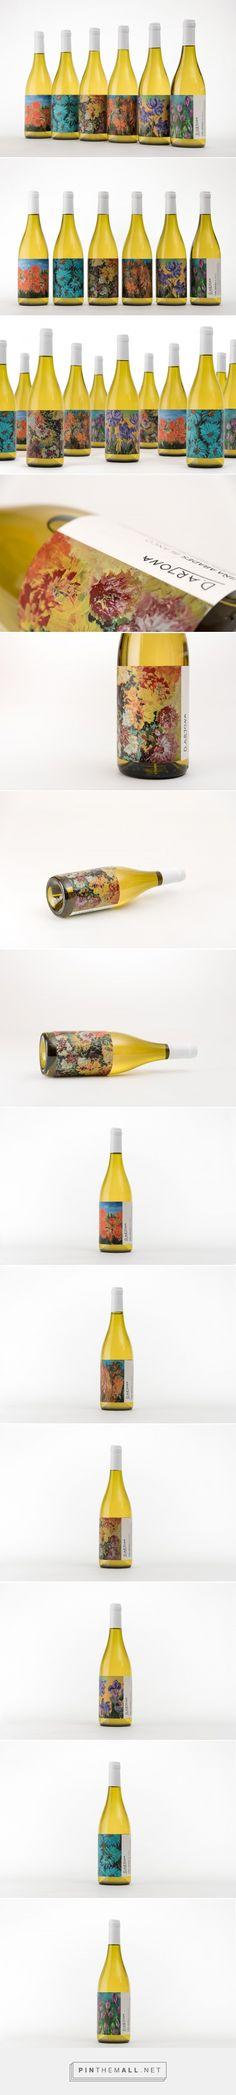 Art and Viña Abades wine packaging design by Buenaventura Estudio - http://www.packagingoftheworld.com/2017/12/art-and-vina-abades.html